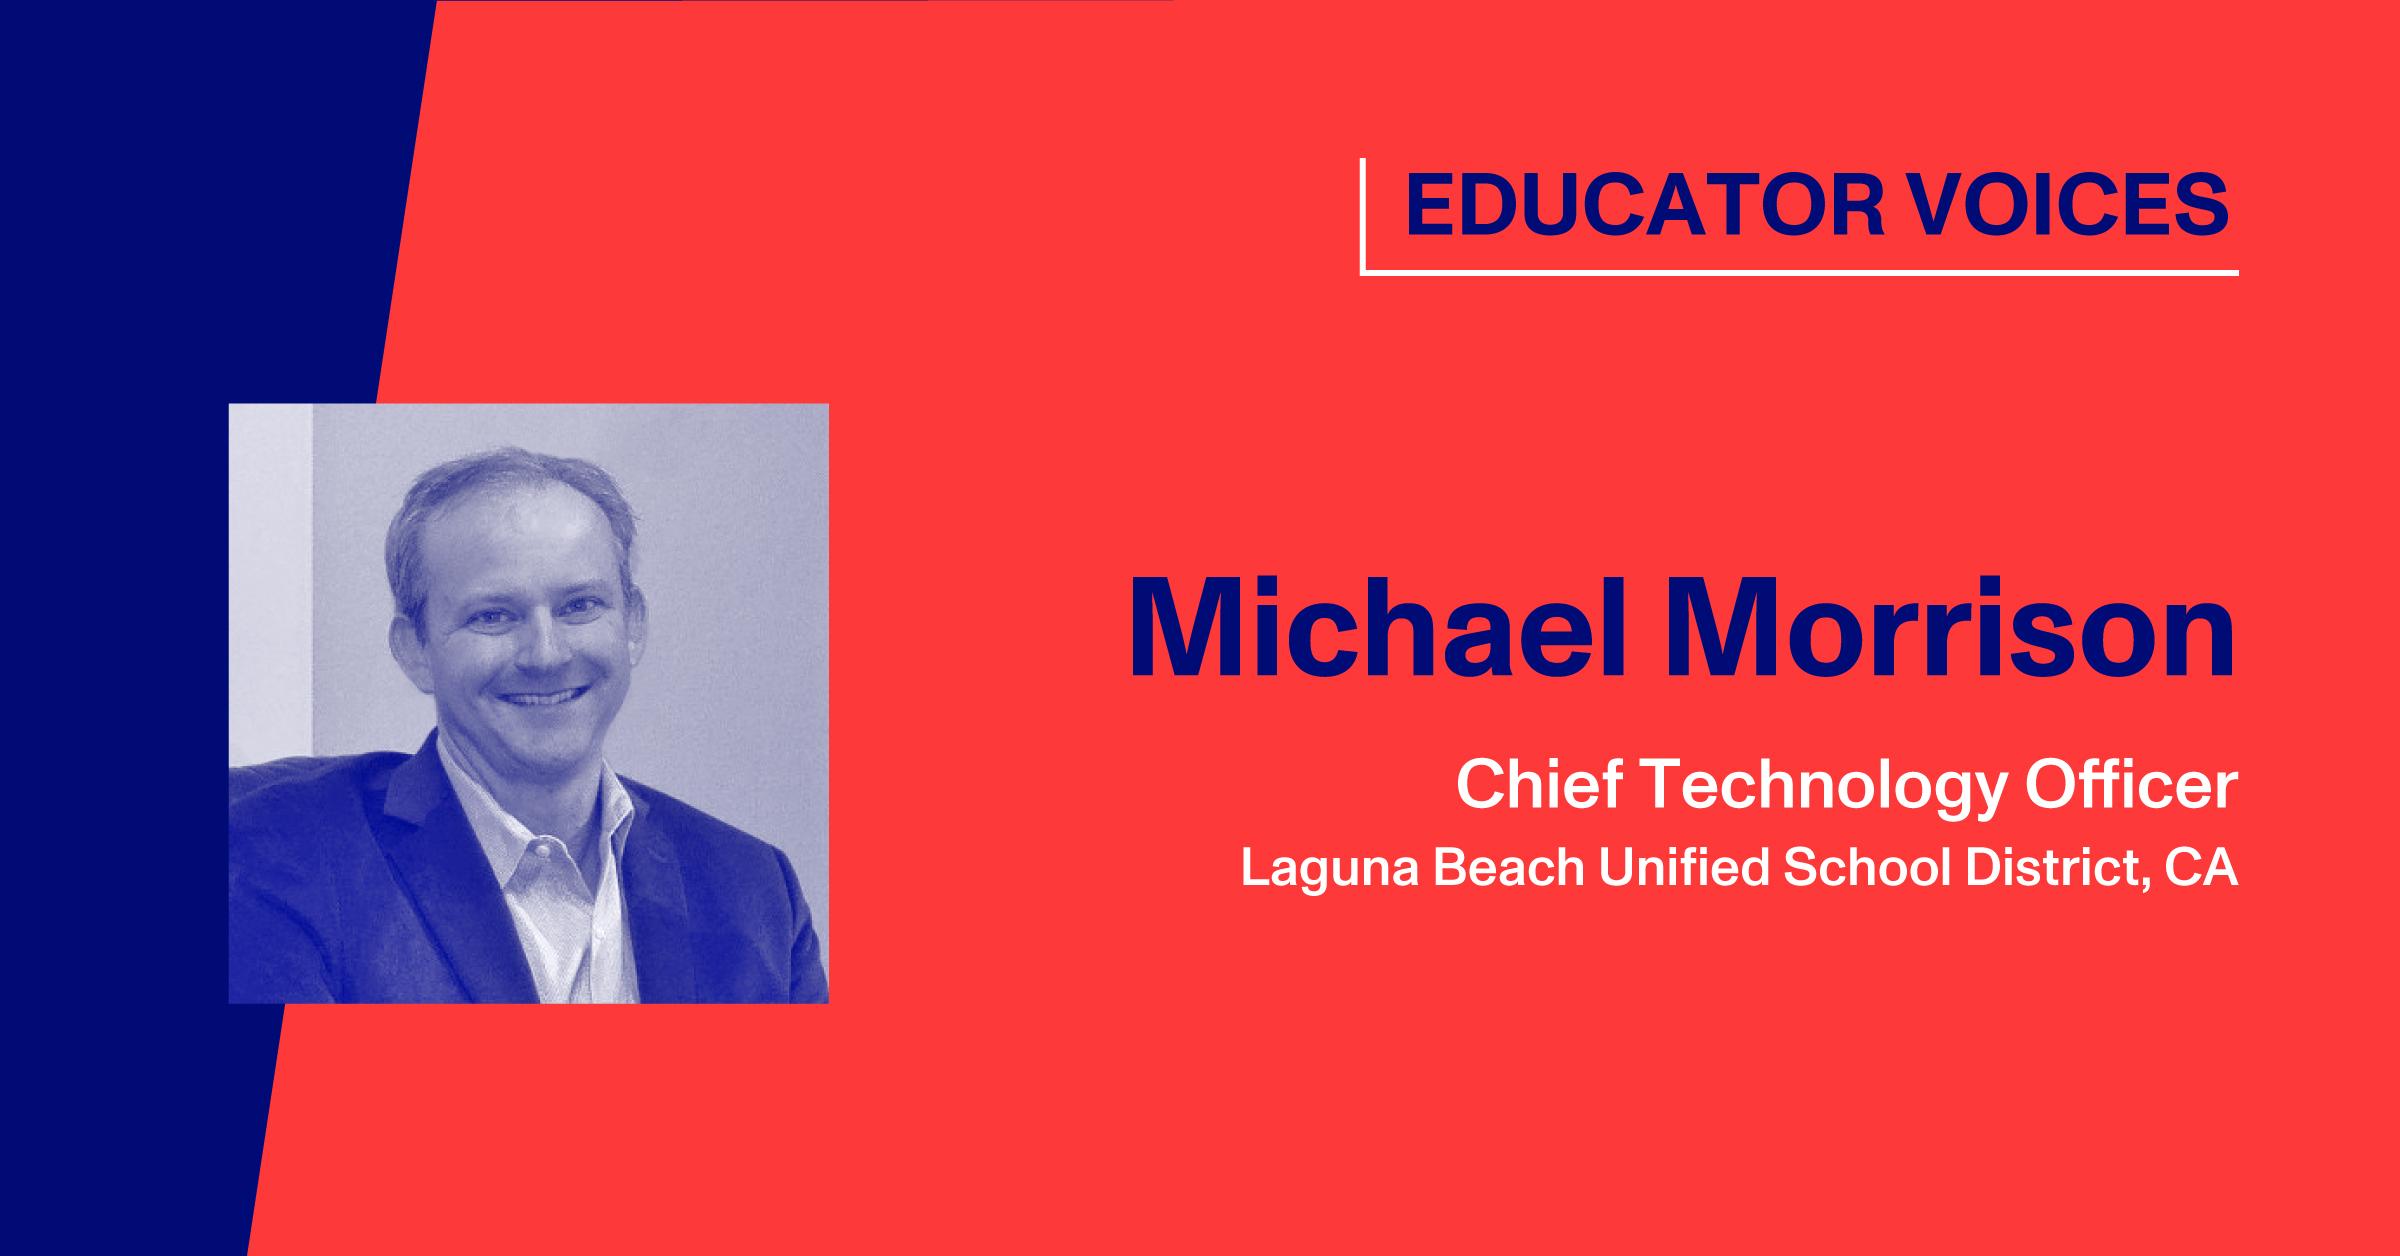 Michael Morrison, Chief Technology Officer, Laguna Beach Unified School District, CA